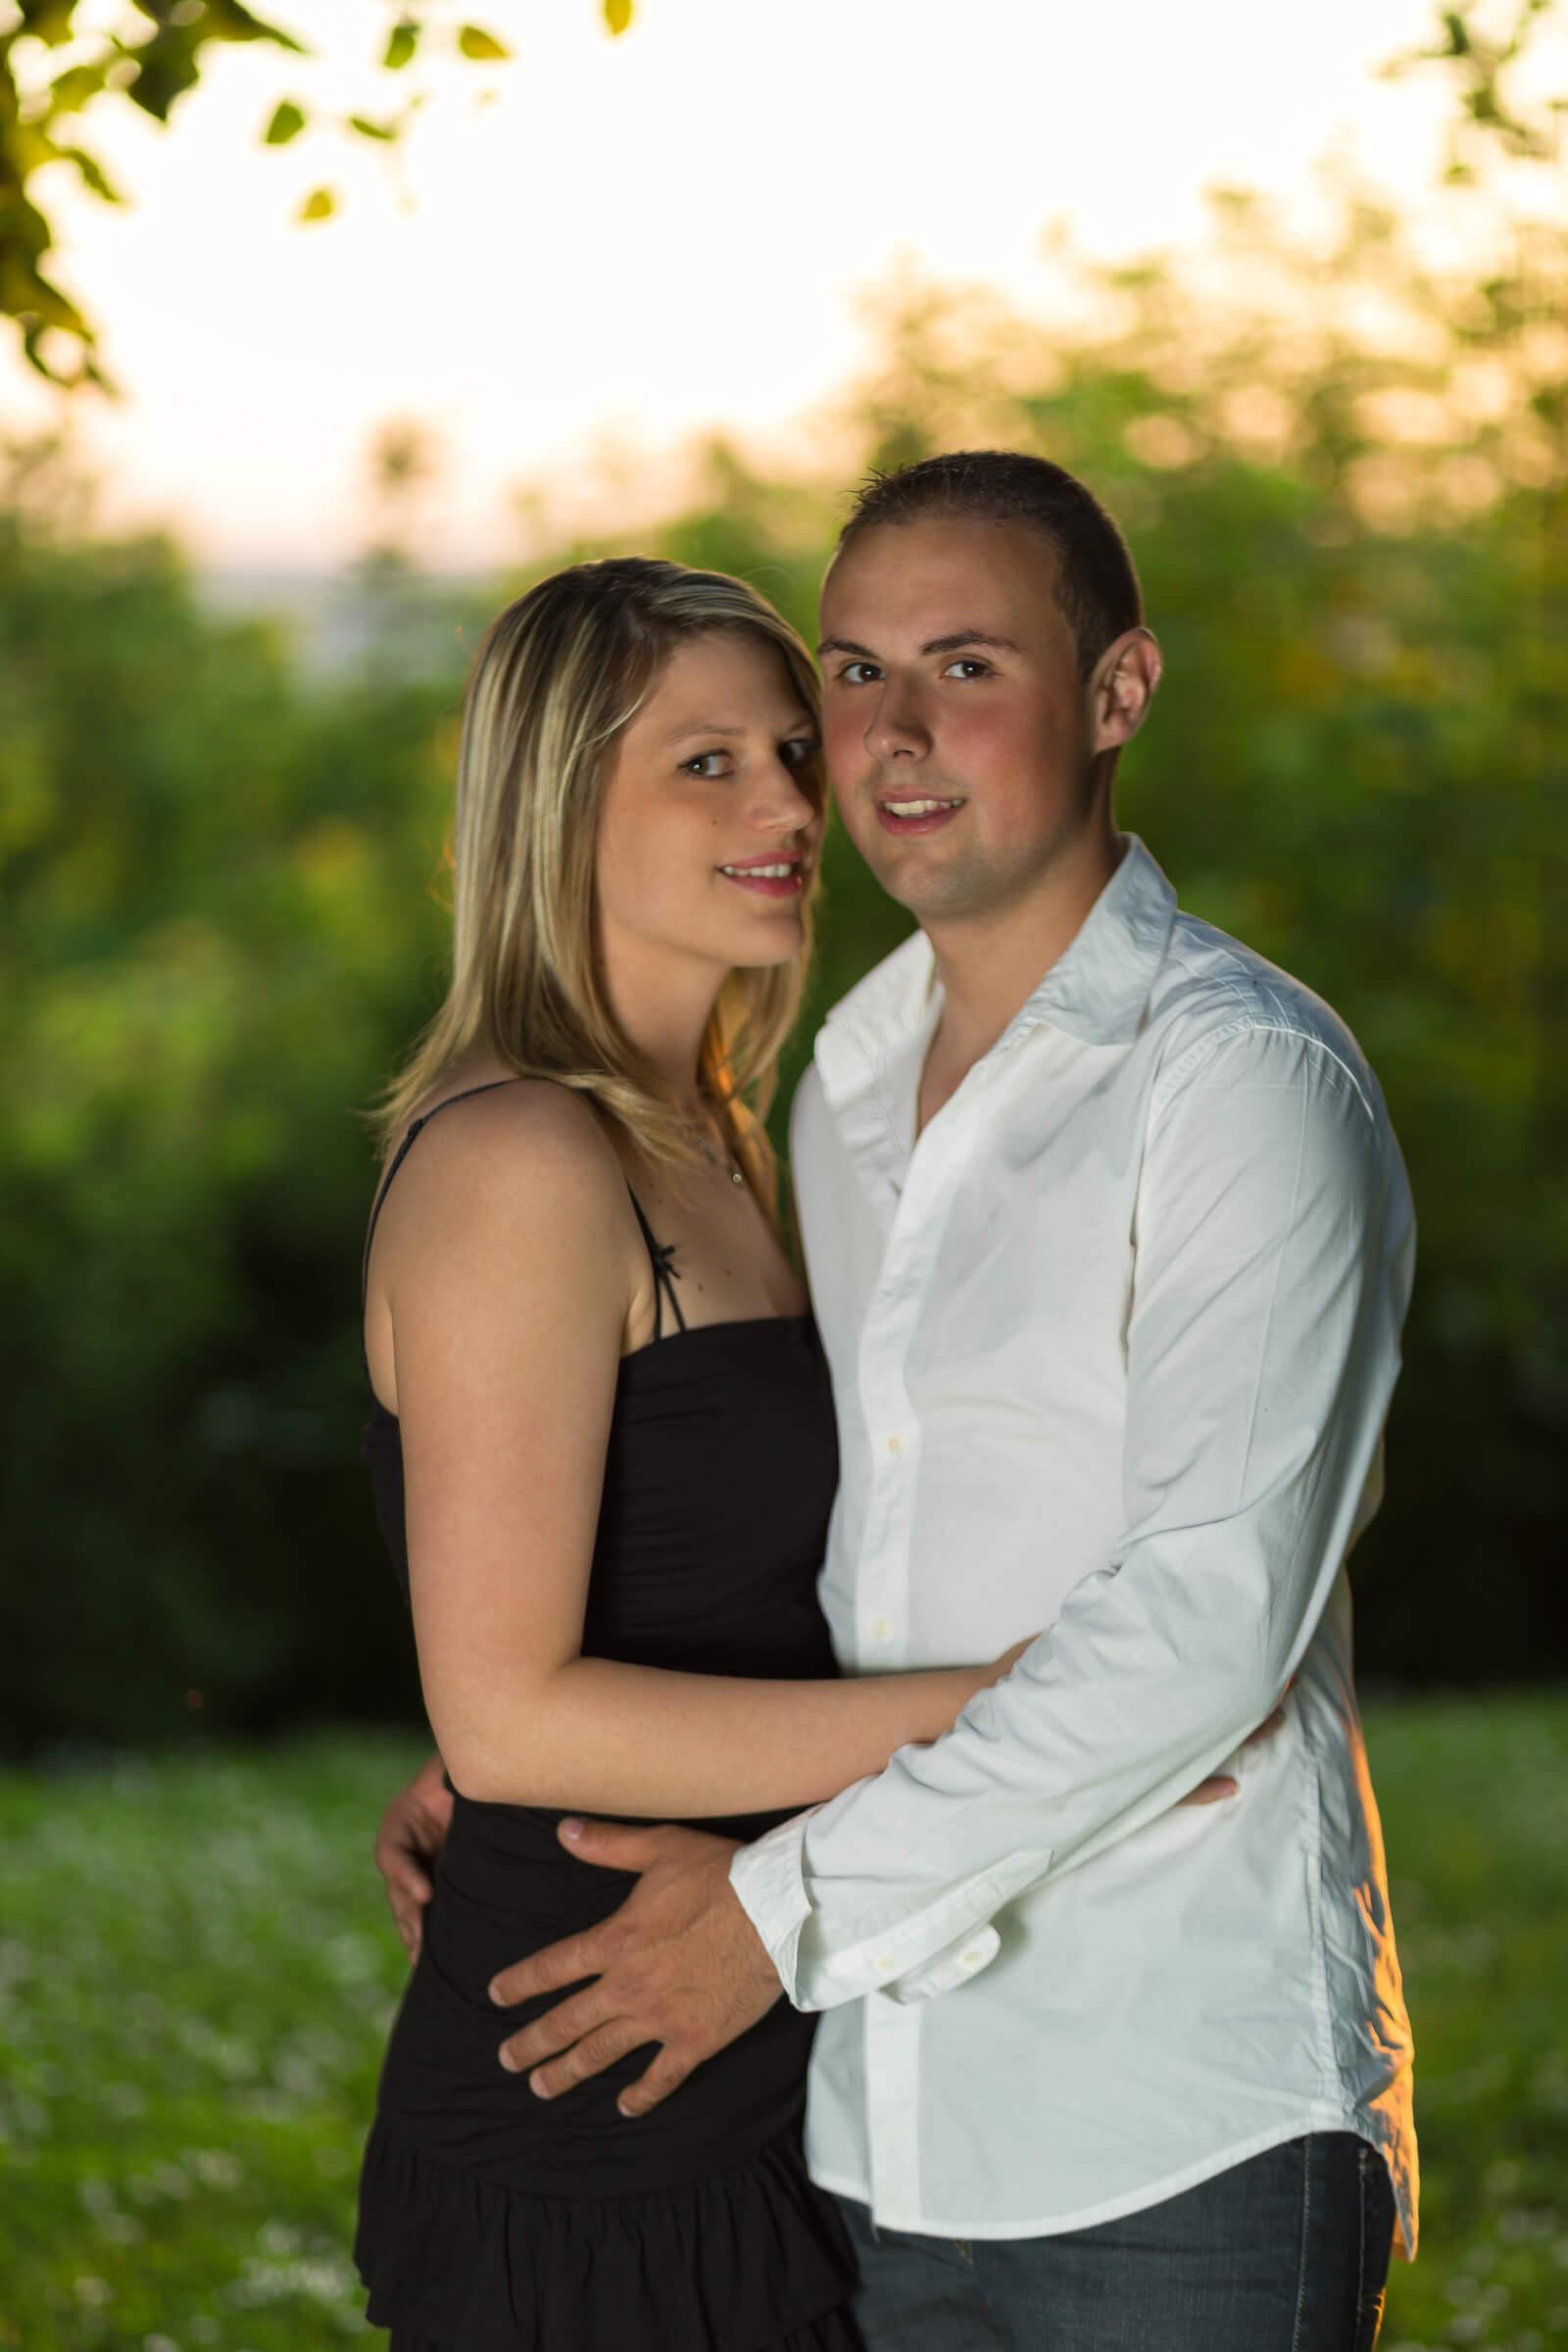 Photographe epernay Photo couple Tristan Meunier-6.jpg